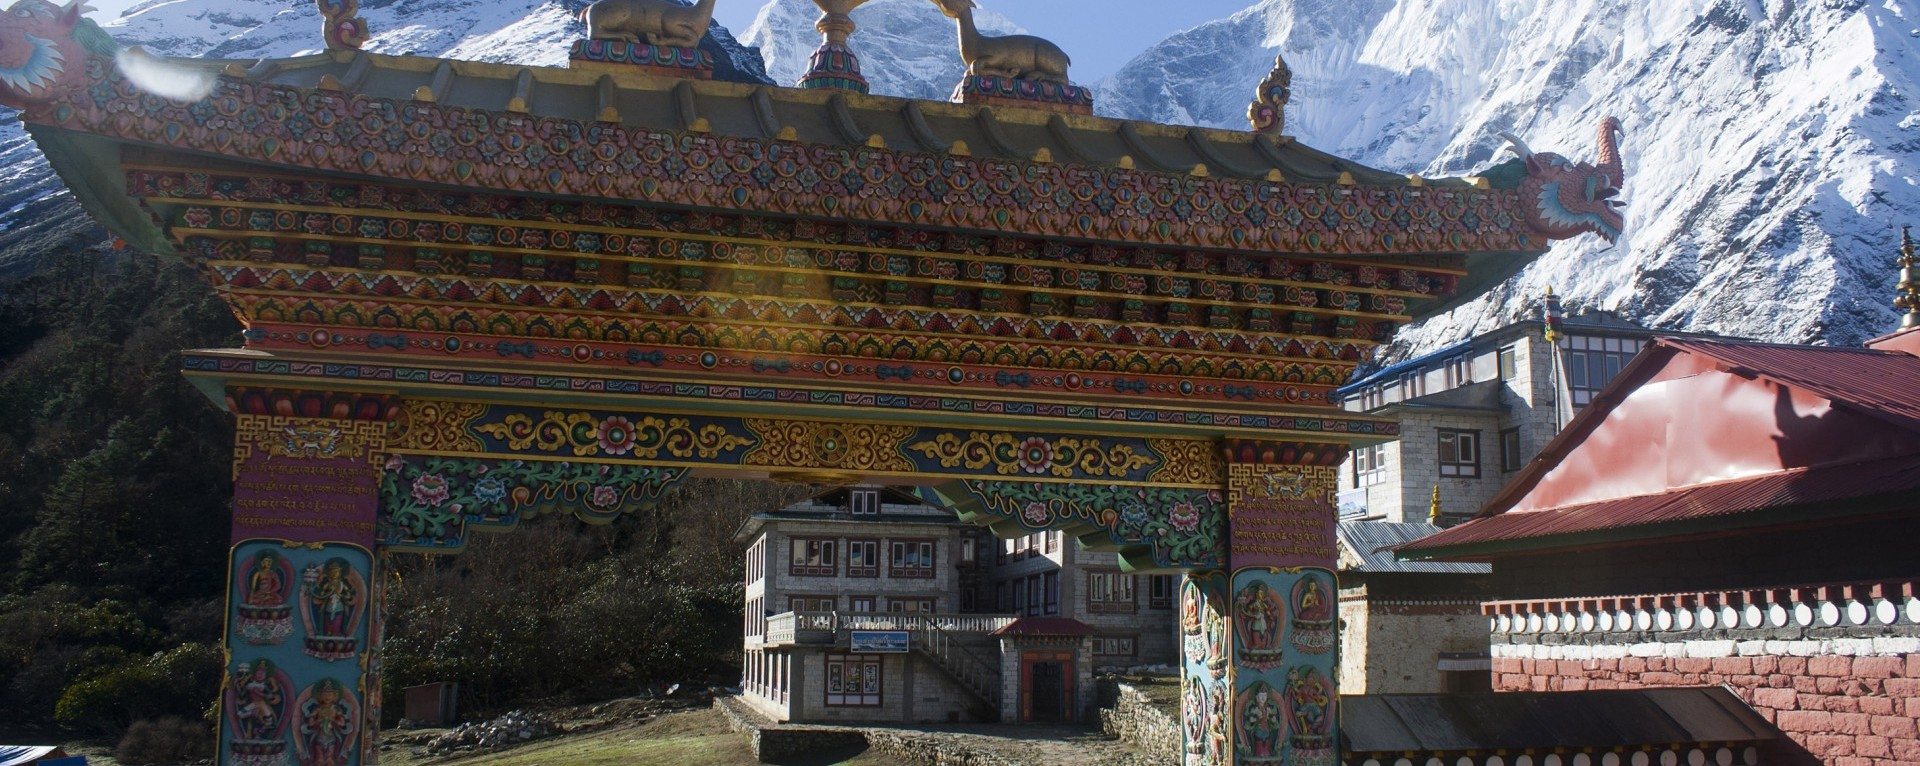 Mani Rimdu Festival Trekking-0